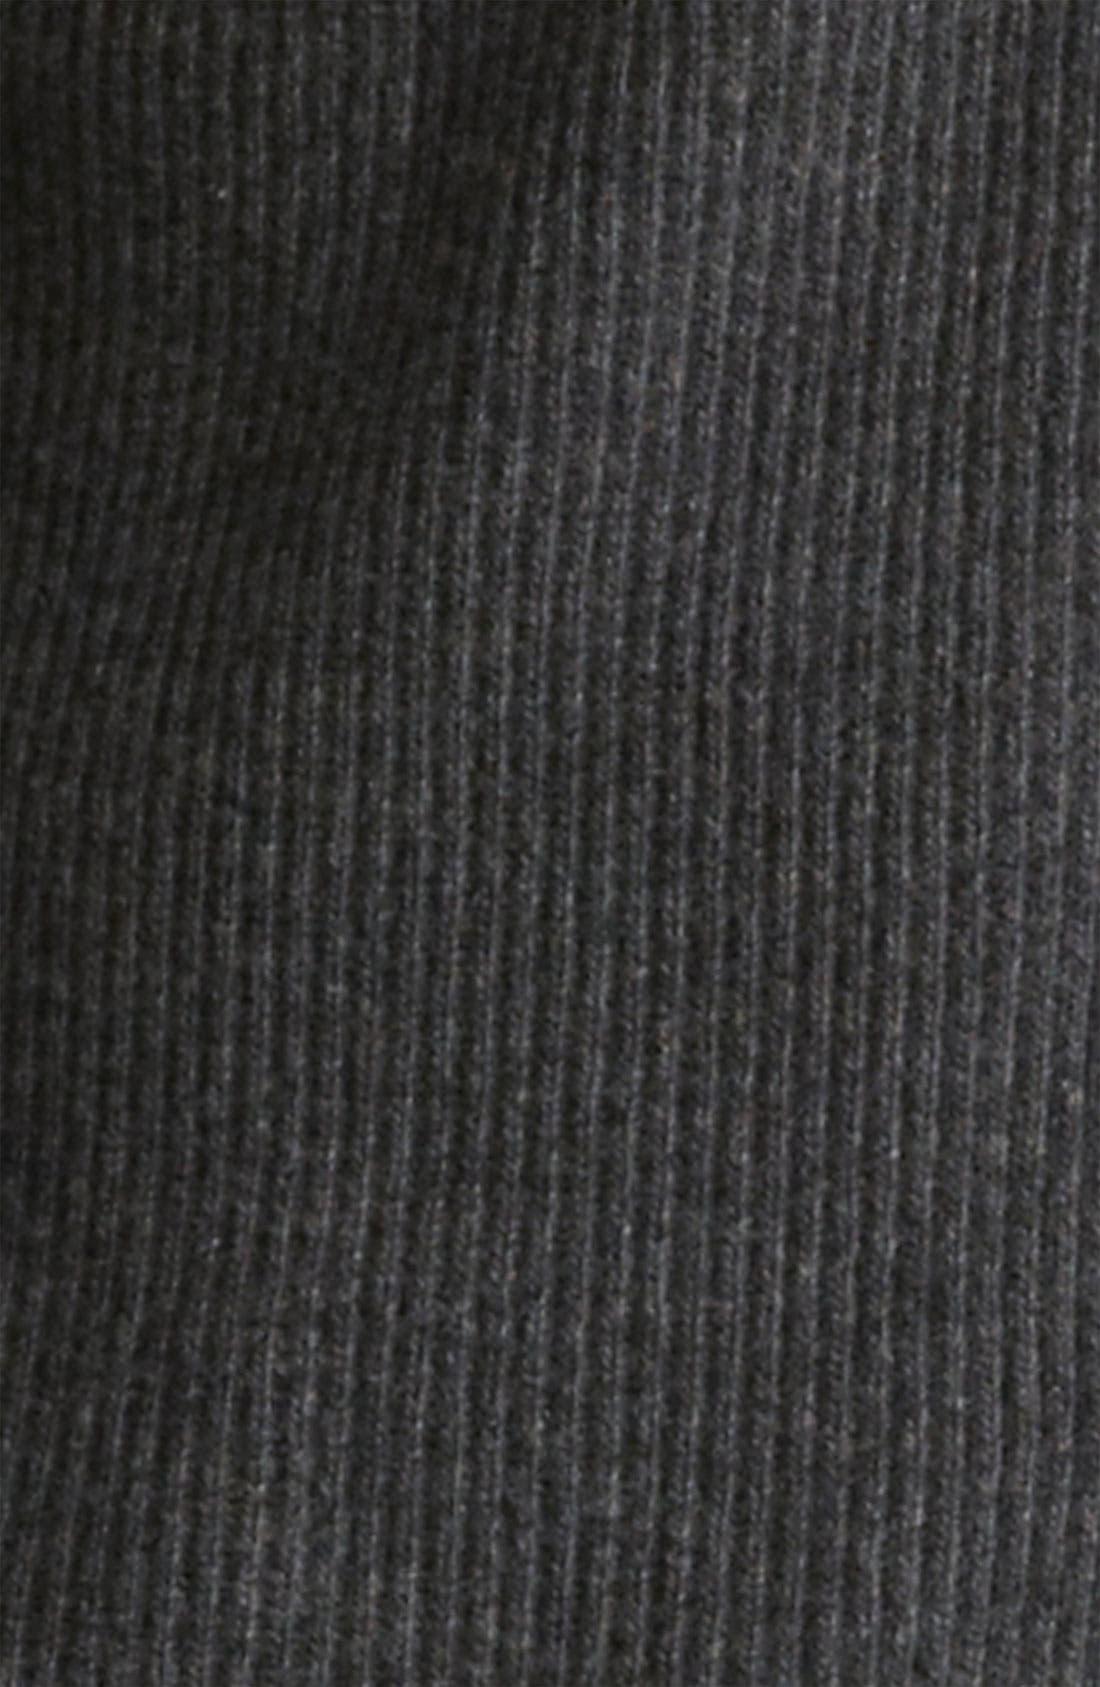 Alternate Image 3  - Marni Two Tone Wool & Cashmere Cardigan